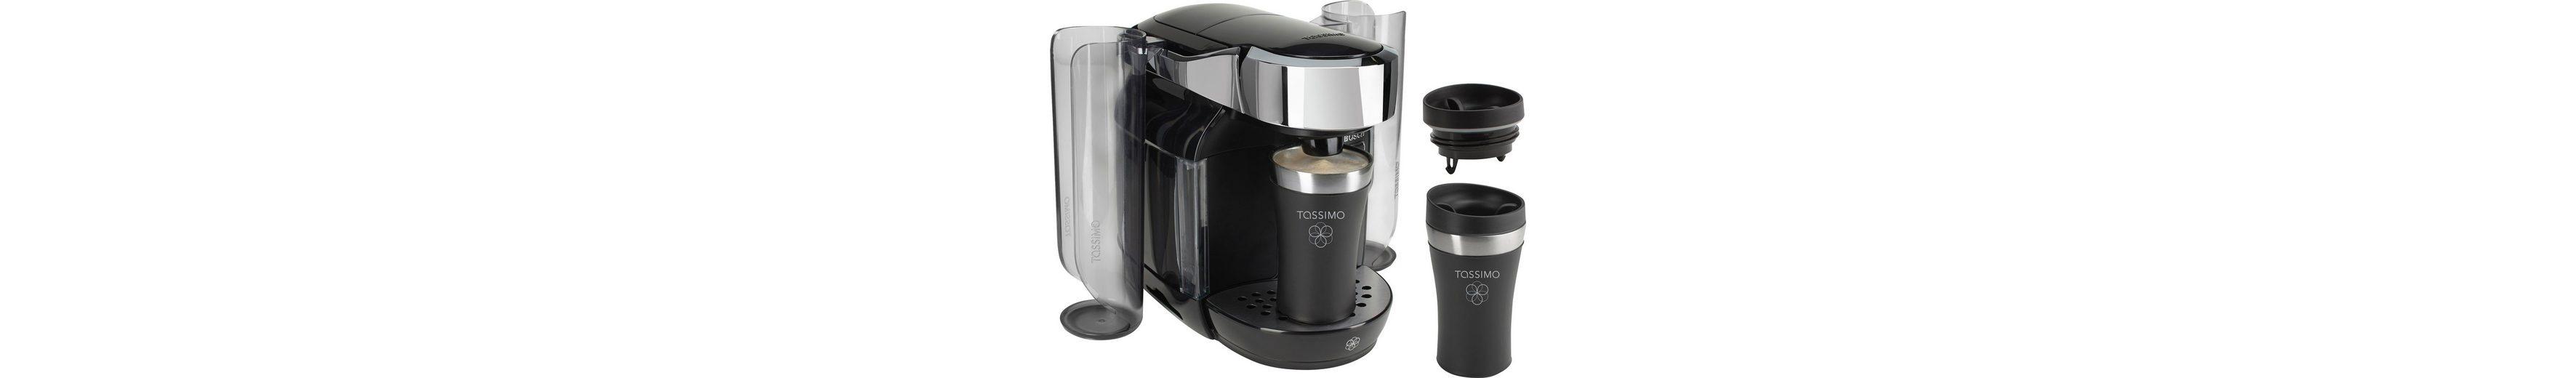 Bosch/Tassimo CADDY Multigetränkesystem TAS7002DE1, inkl 2 Travel Mugs im Wert von 20€ UVP